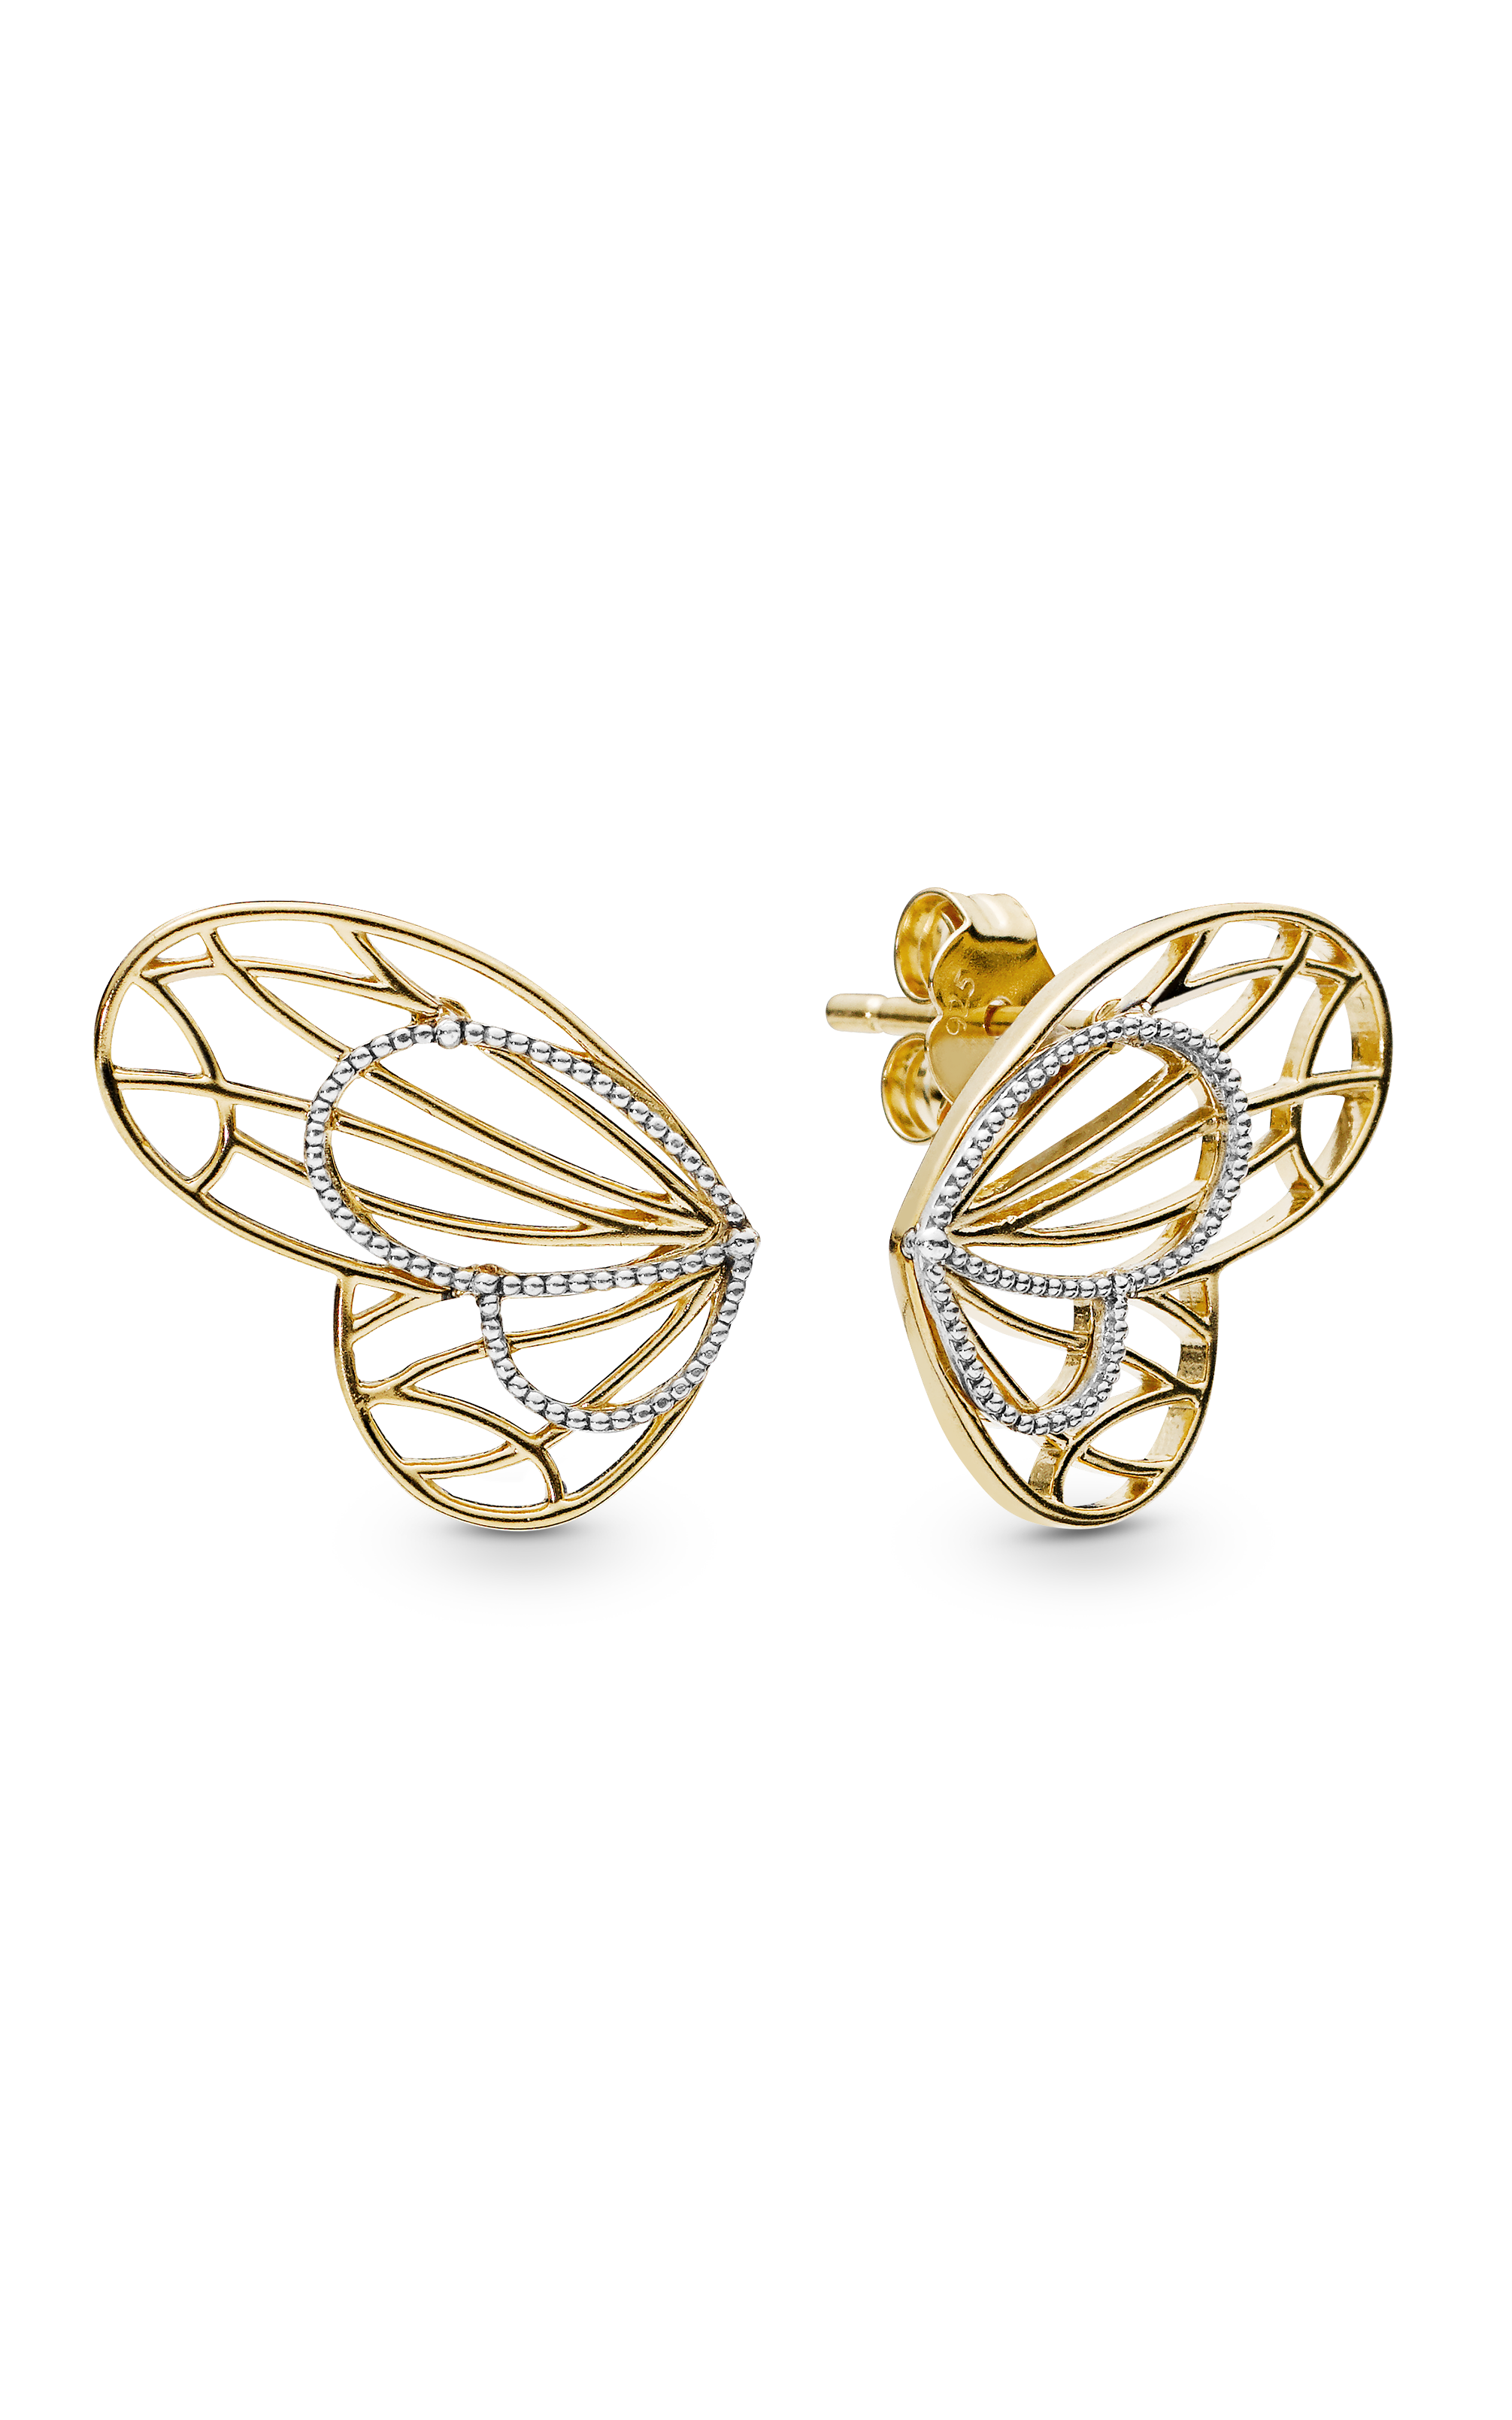 Strieborné 925 náušnice v štýle Pandora motýlie krídla